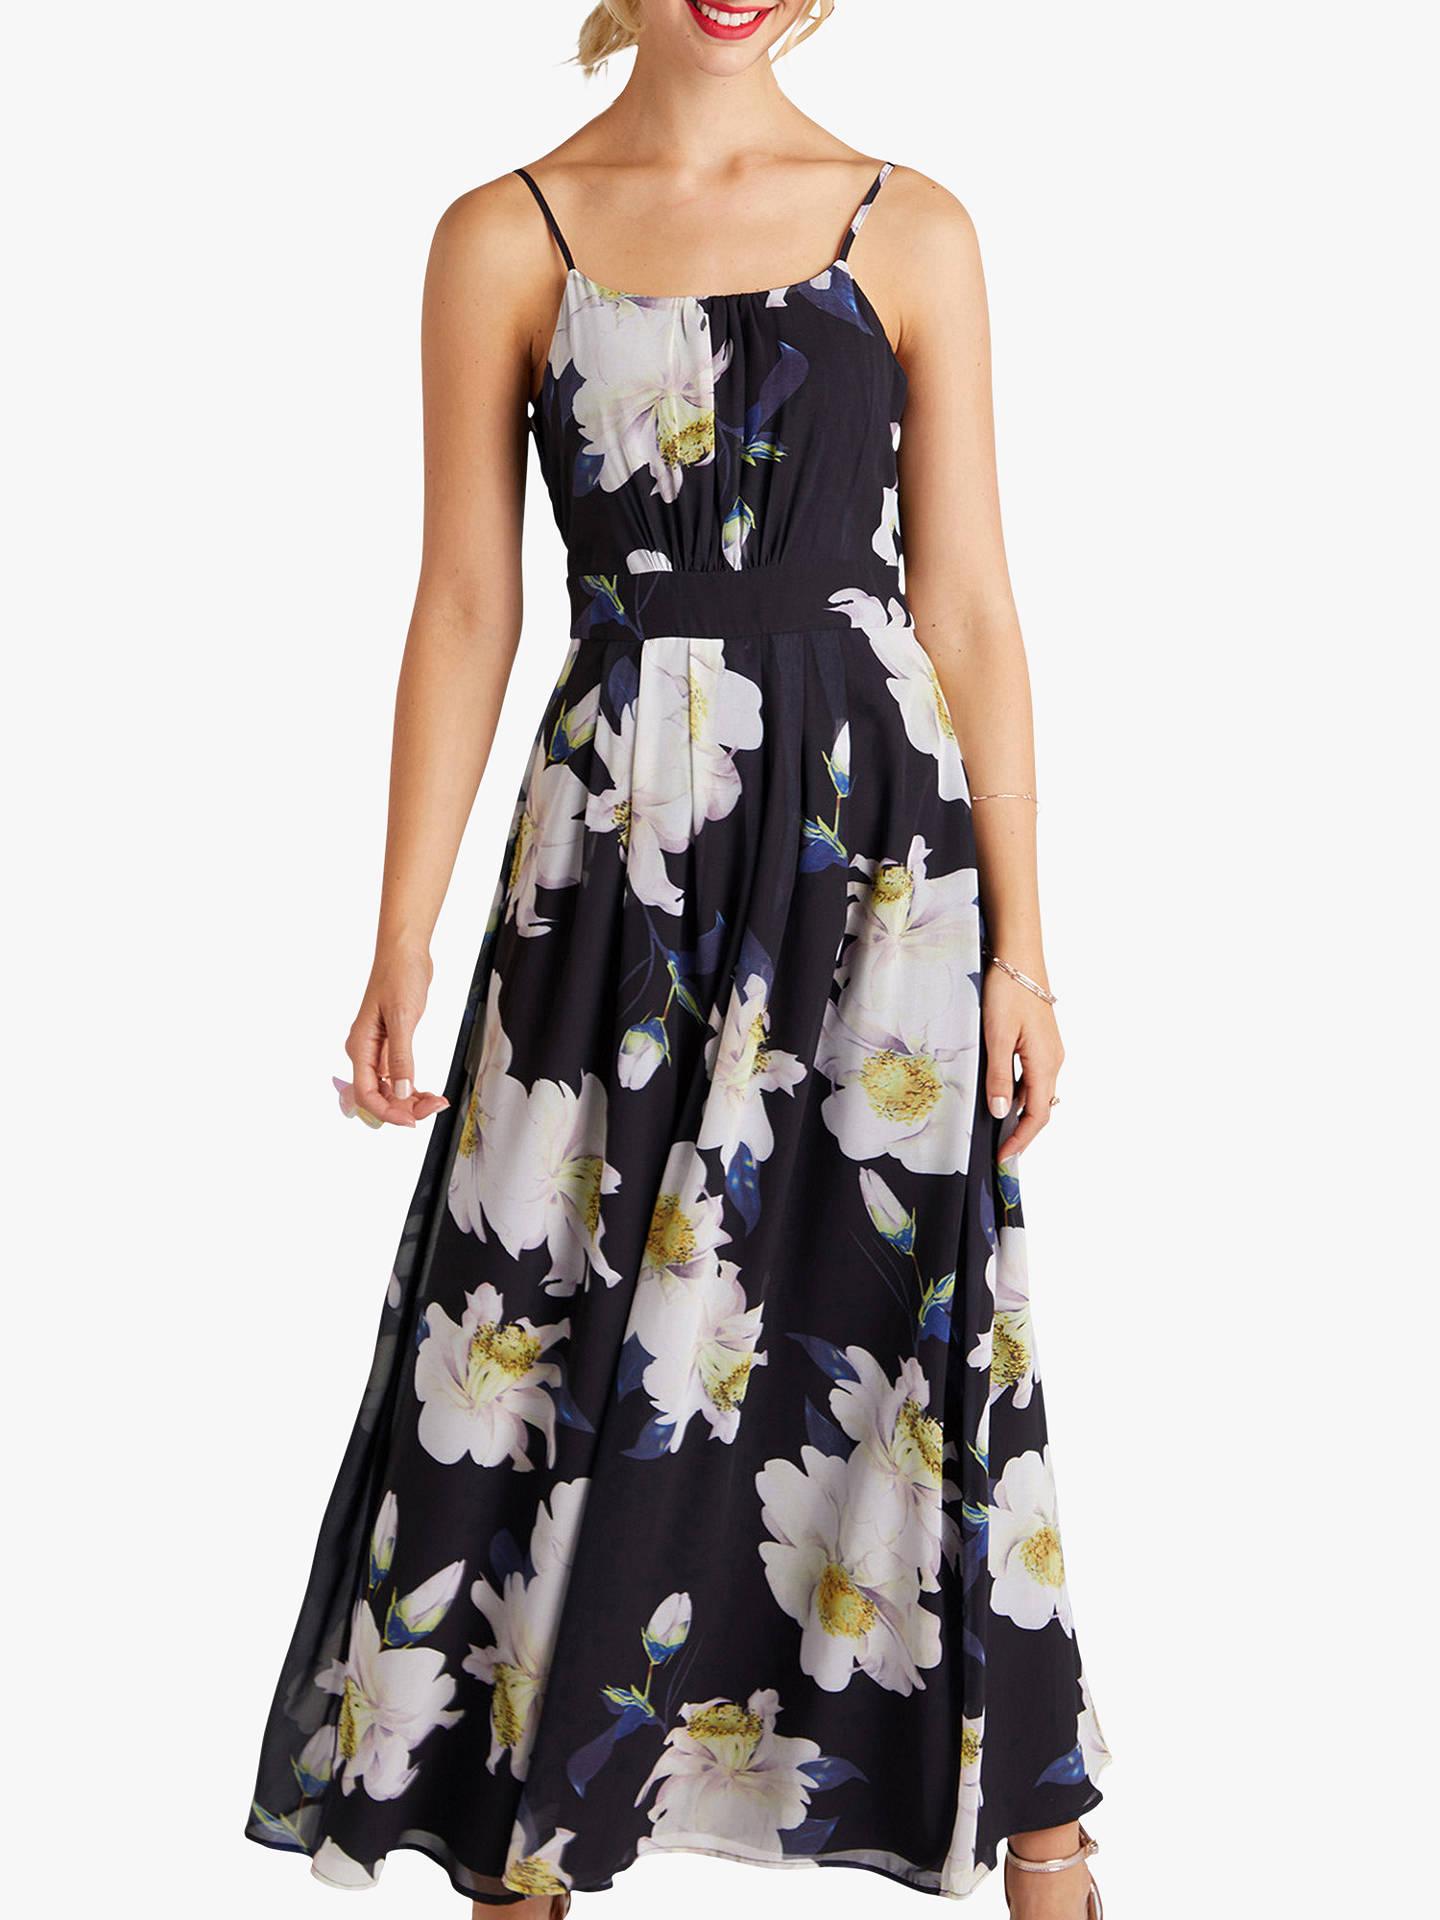 9c5d1b5fede24 Yumi Floral Maxi Dress, Black